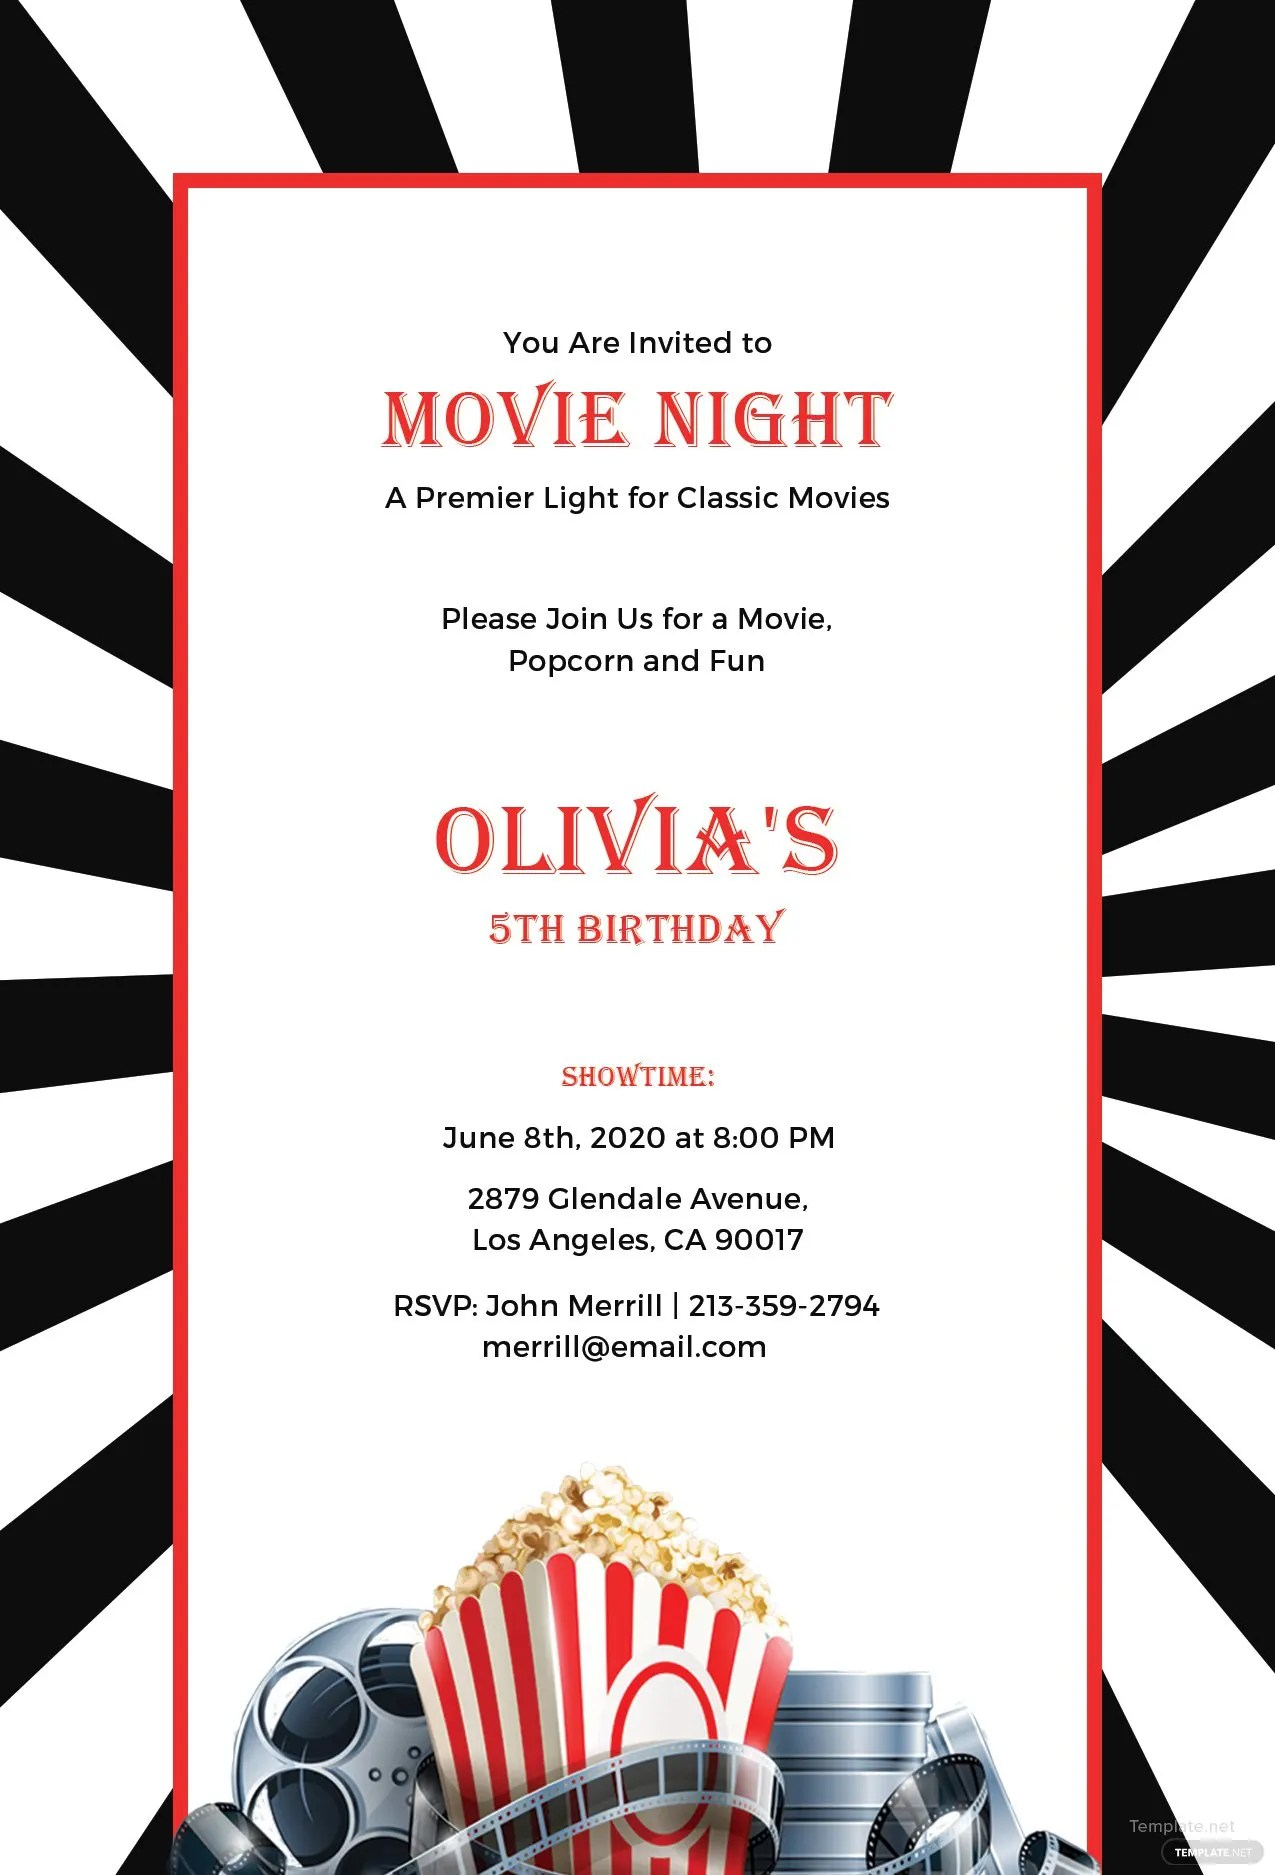 Free Movie Night Invitation Template In Adobe Photoshop Illustrator InDesign Microsoft Word